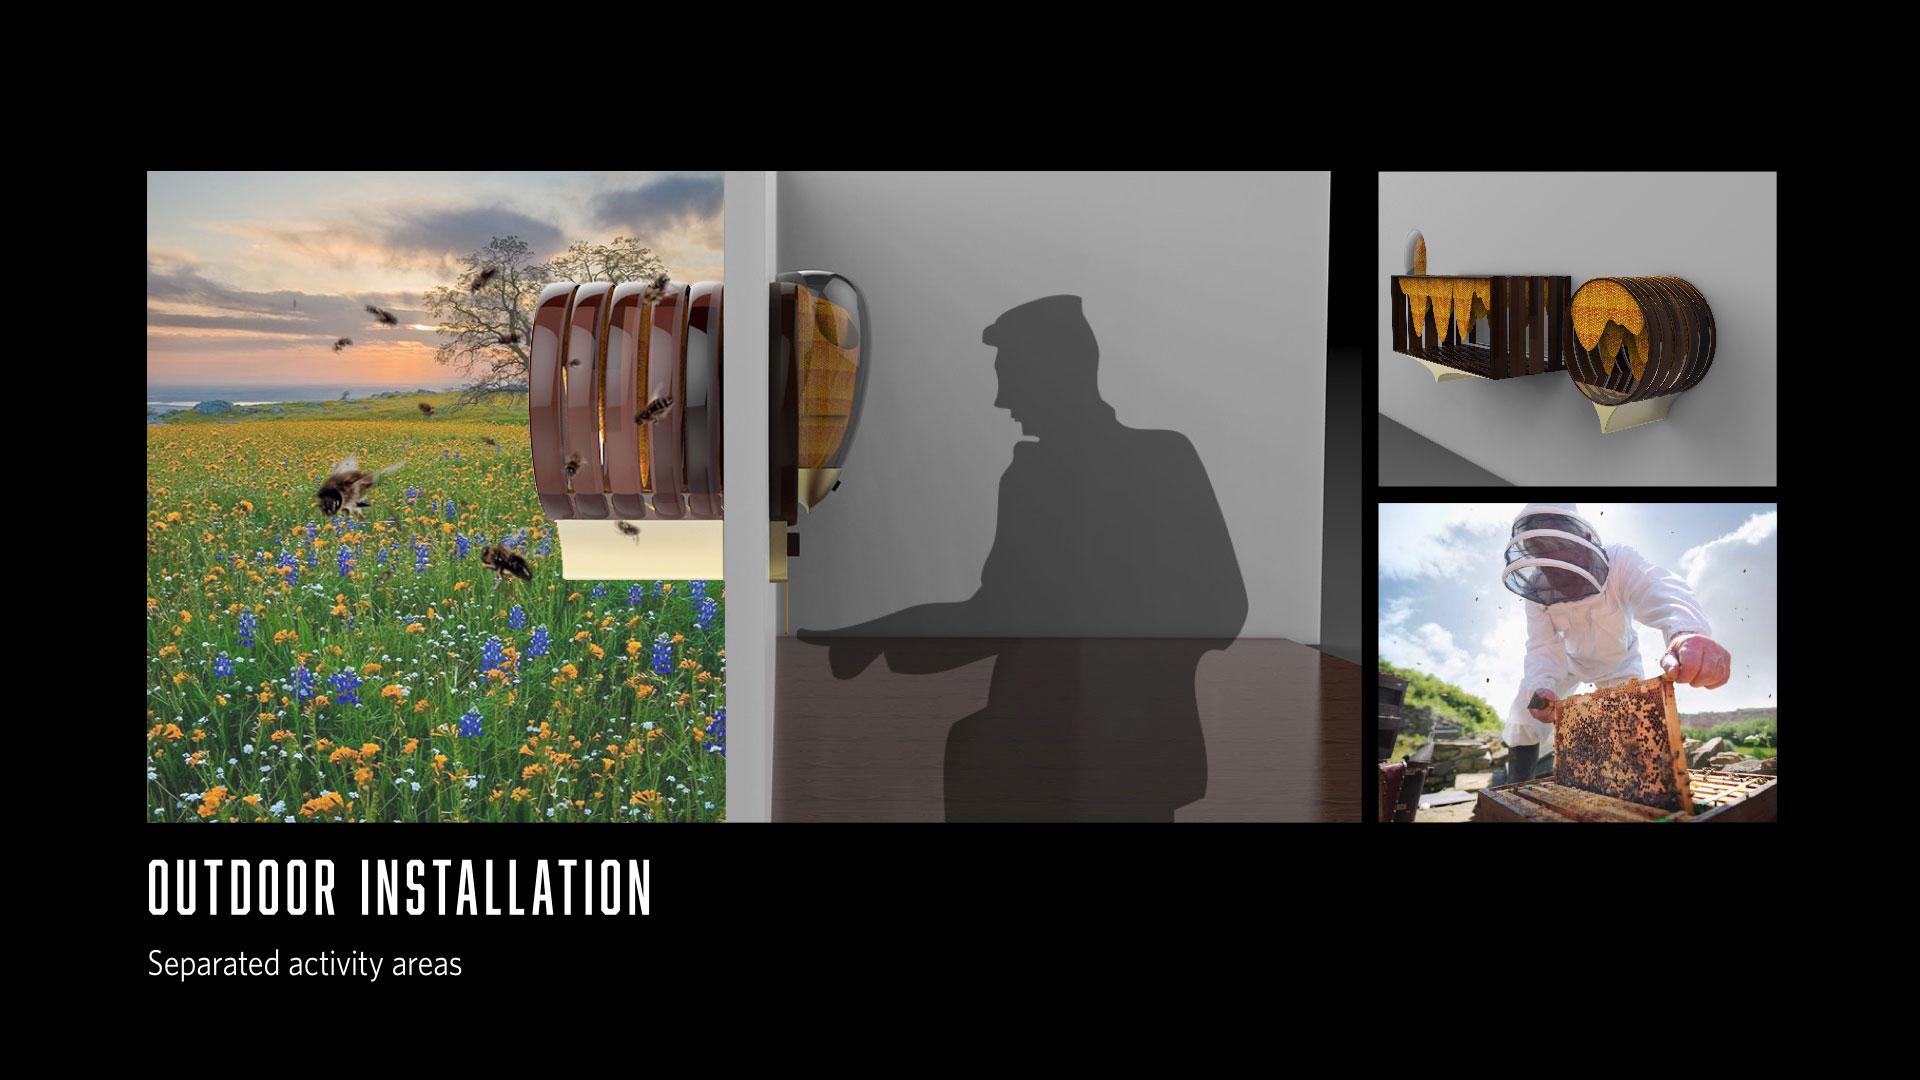 Xu_Beecastle-outdoor-installation.jpg